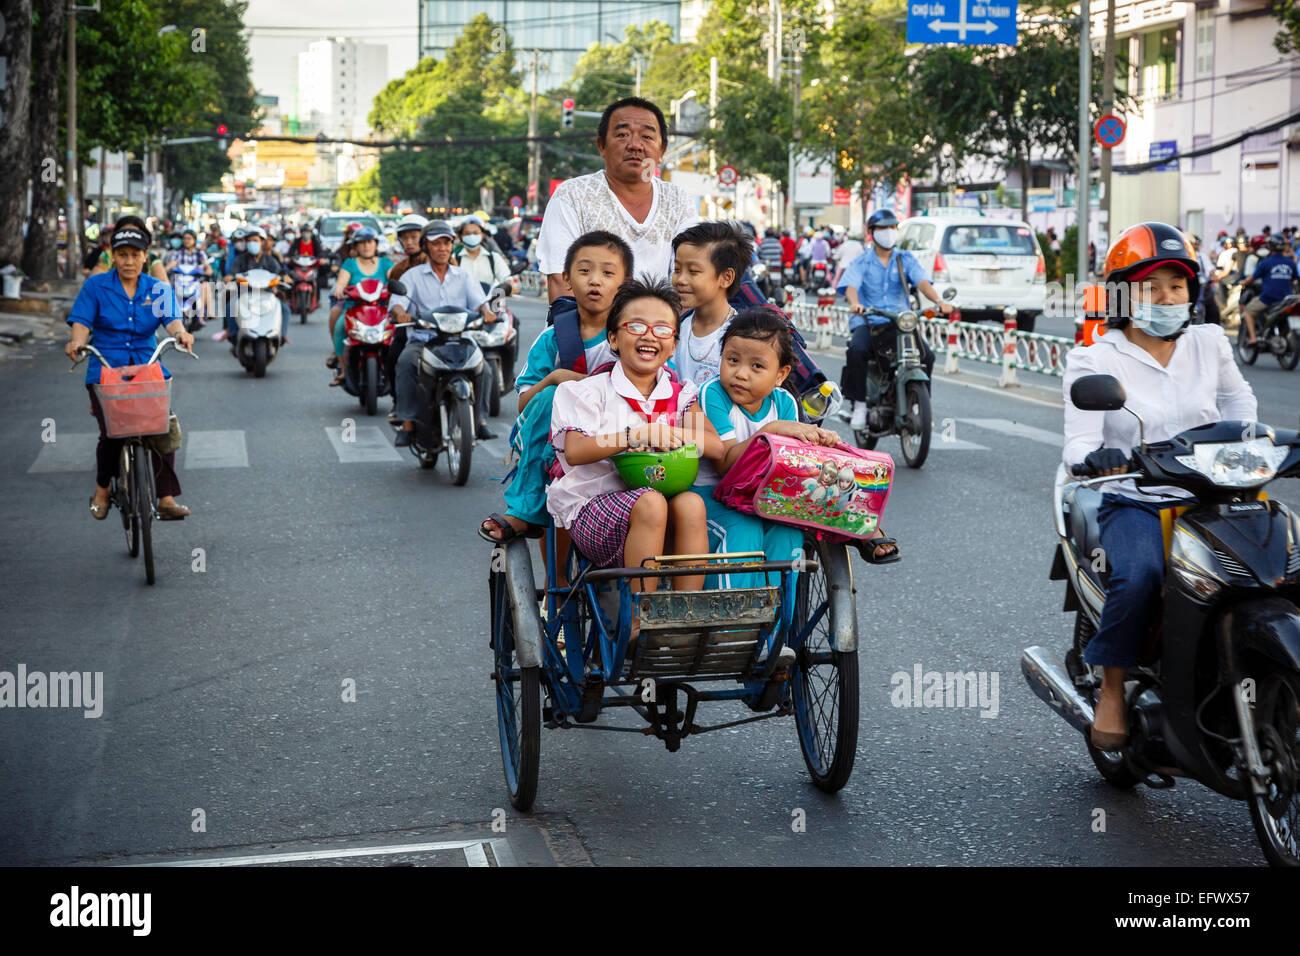 School kids riding a cyclo on a busy street, Ho Chi Minh City (Saigon), Vietnam. - Stock Image